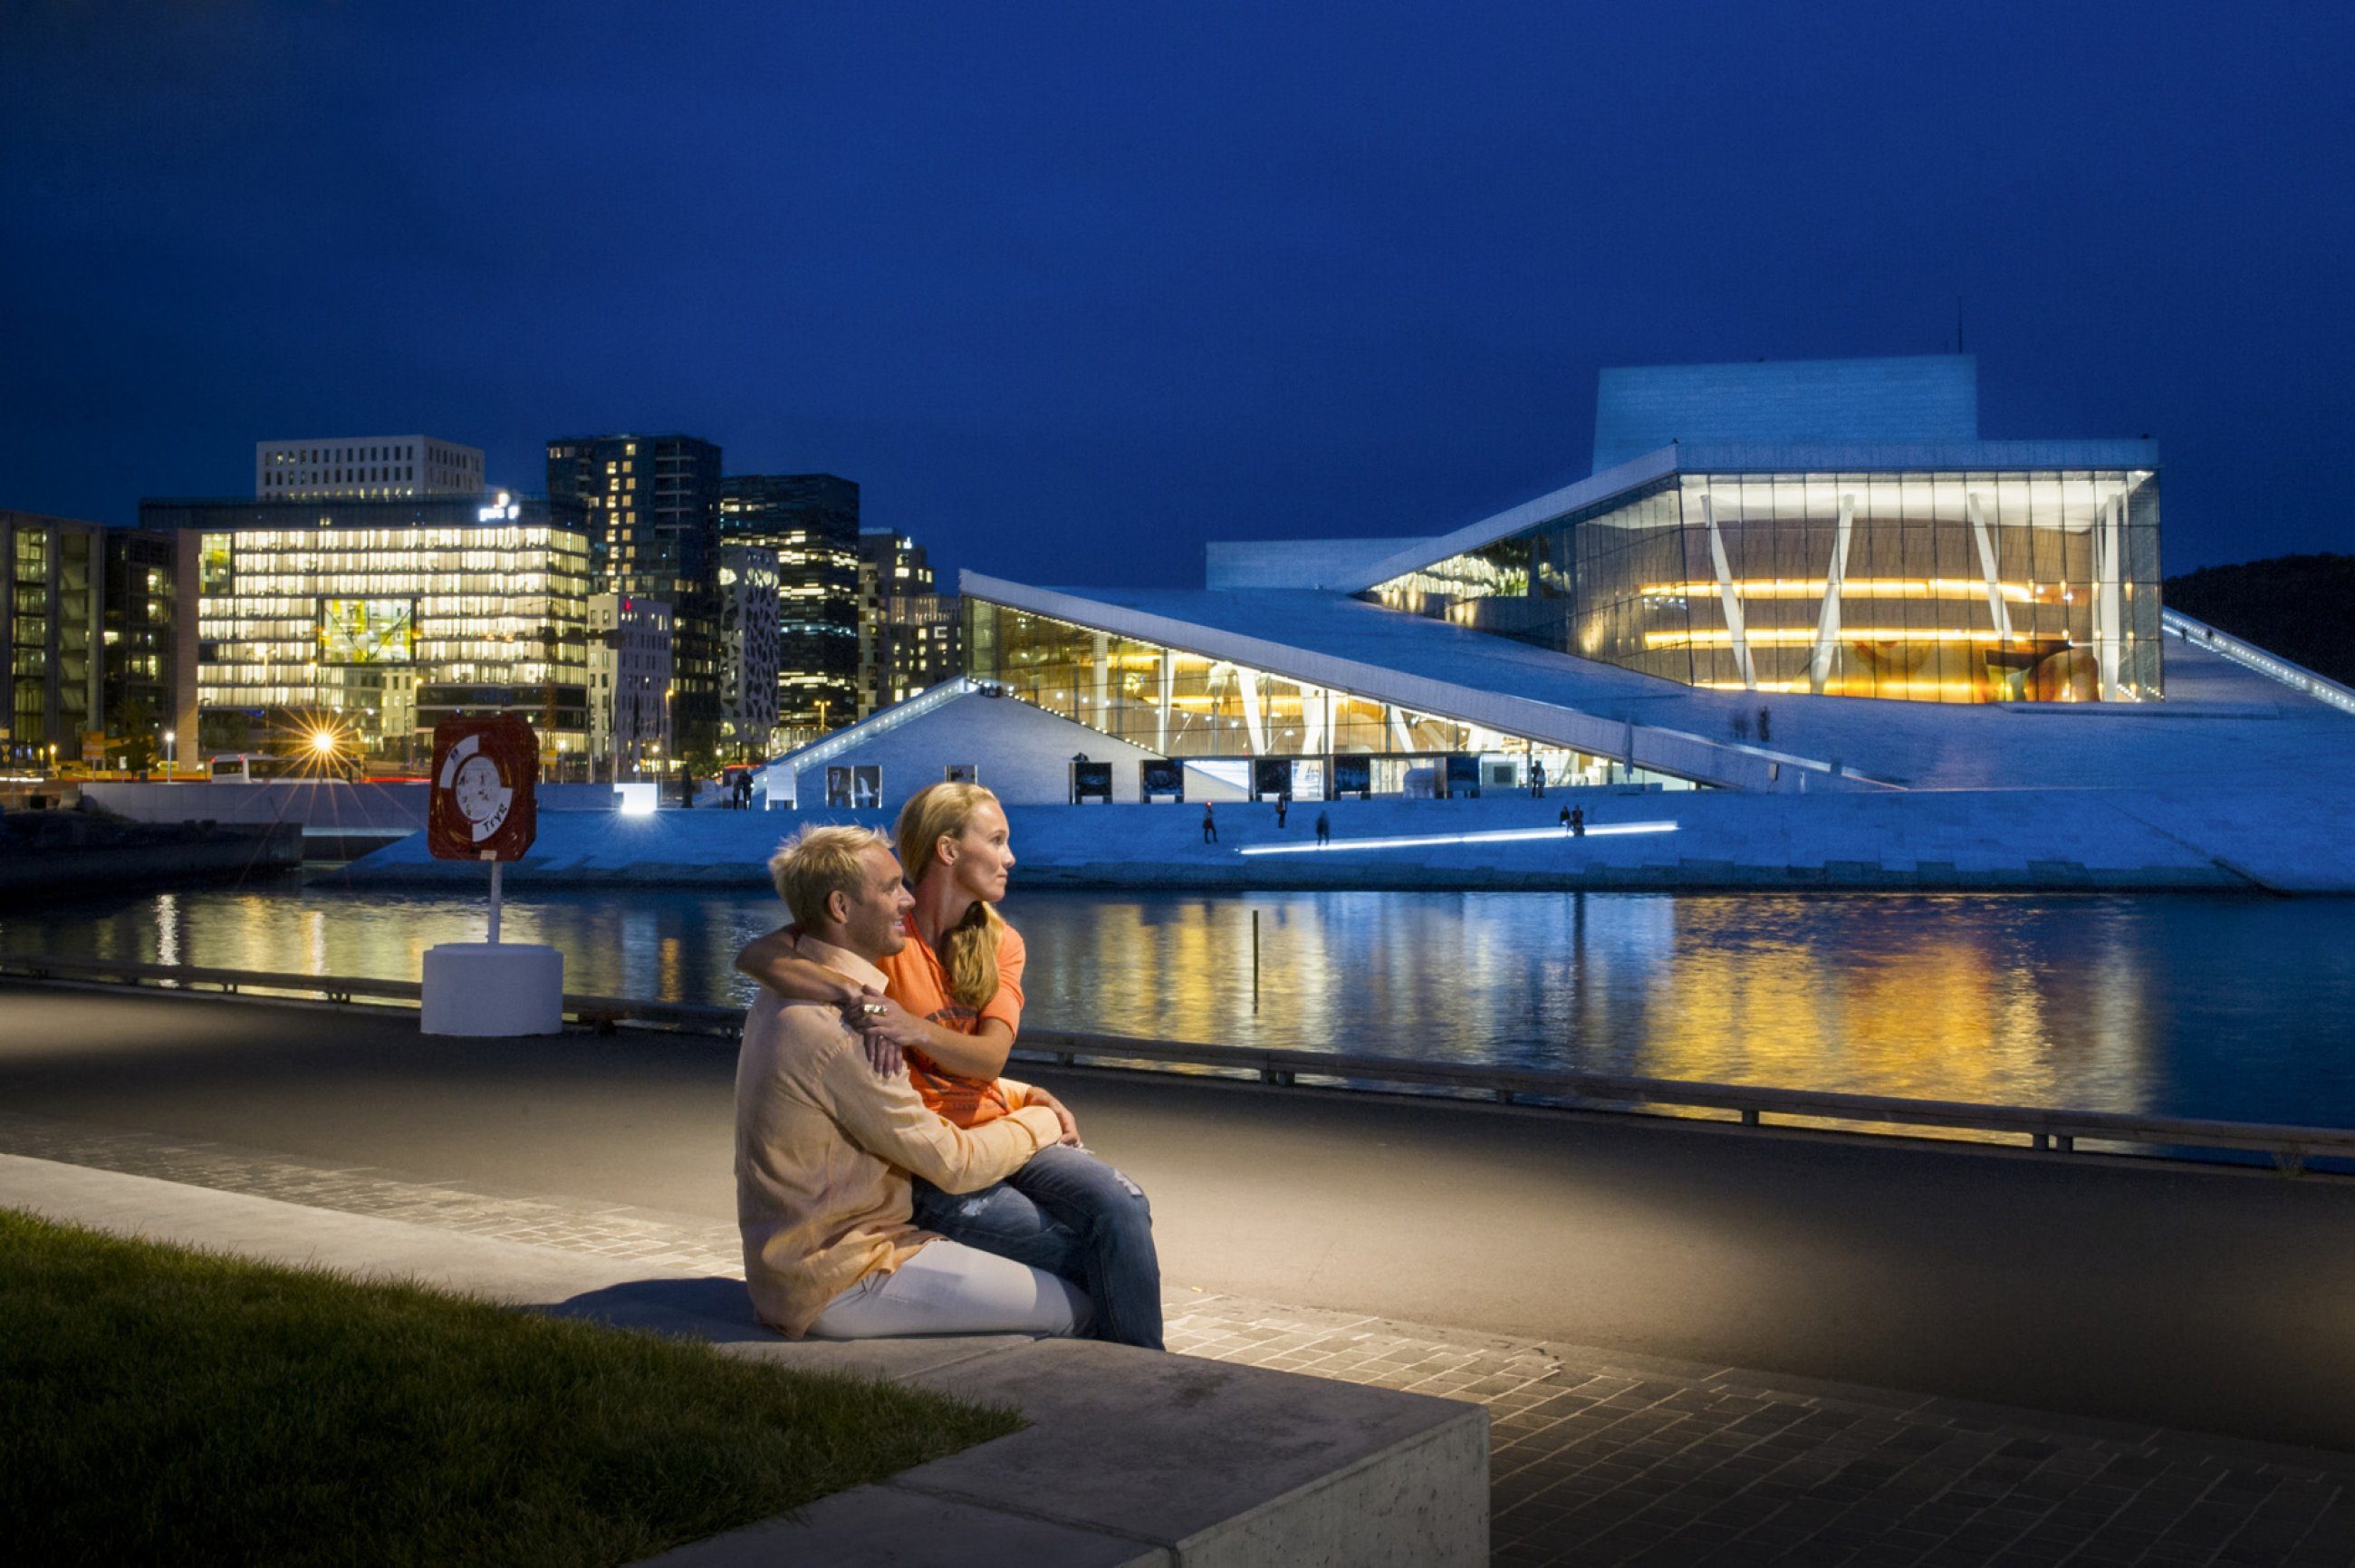 https://bubo.sk/uploads/galleries/7531/norsko-oslo-opera-house-by-night-visitnorway.com.jpg